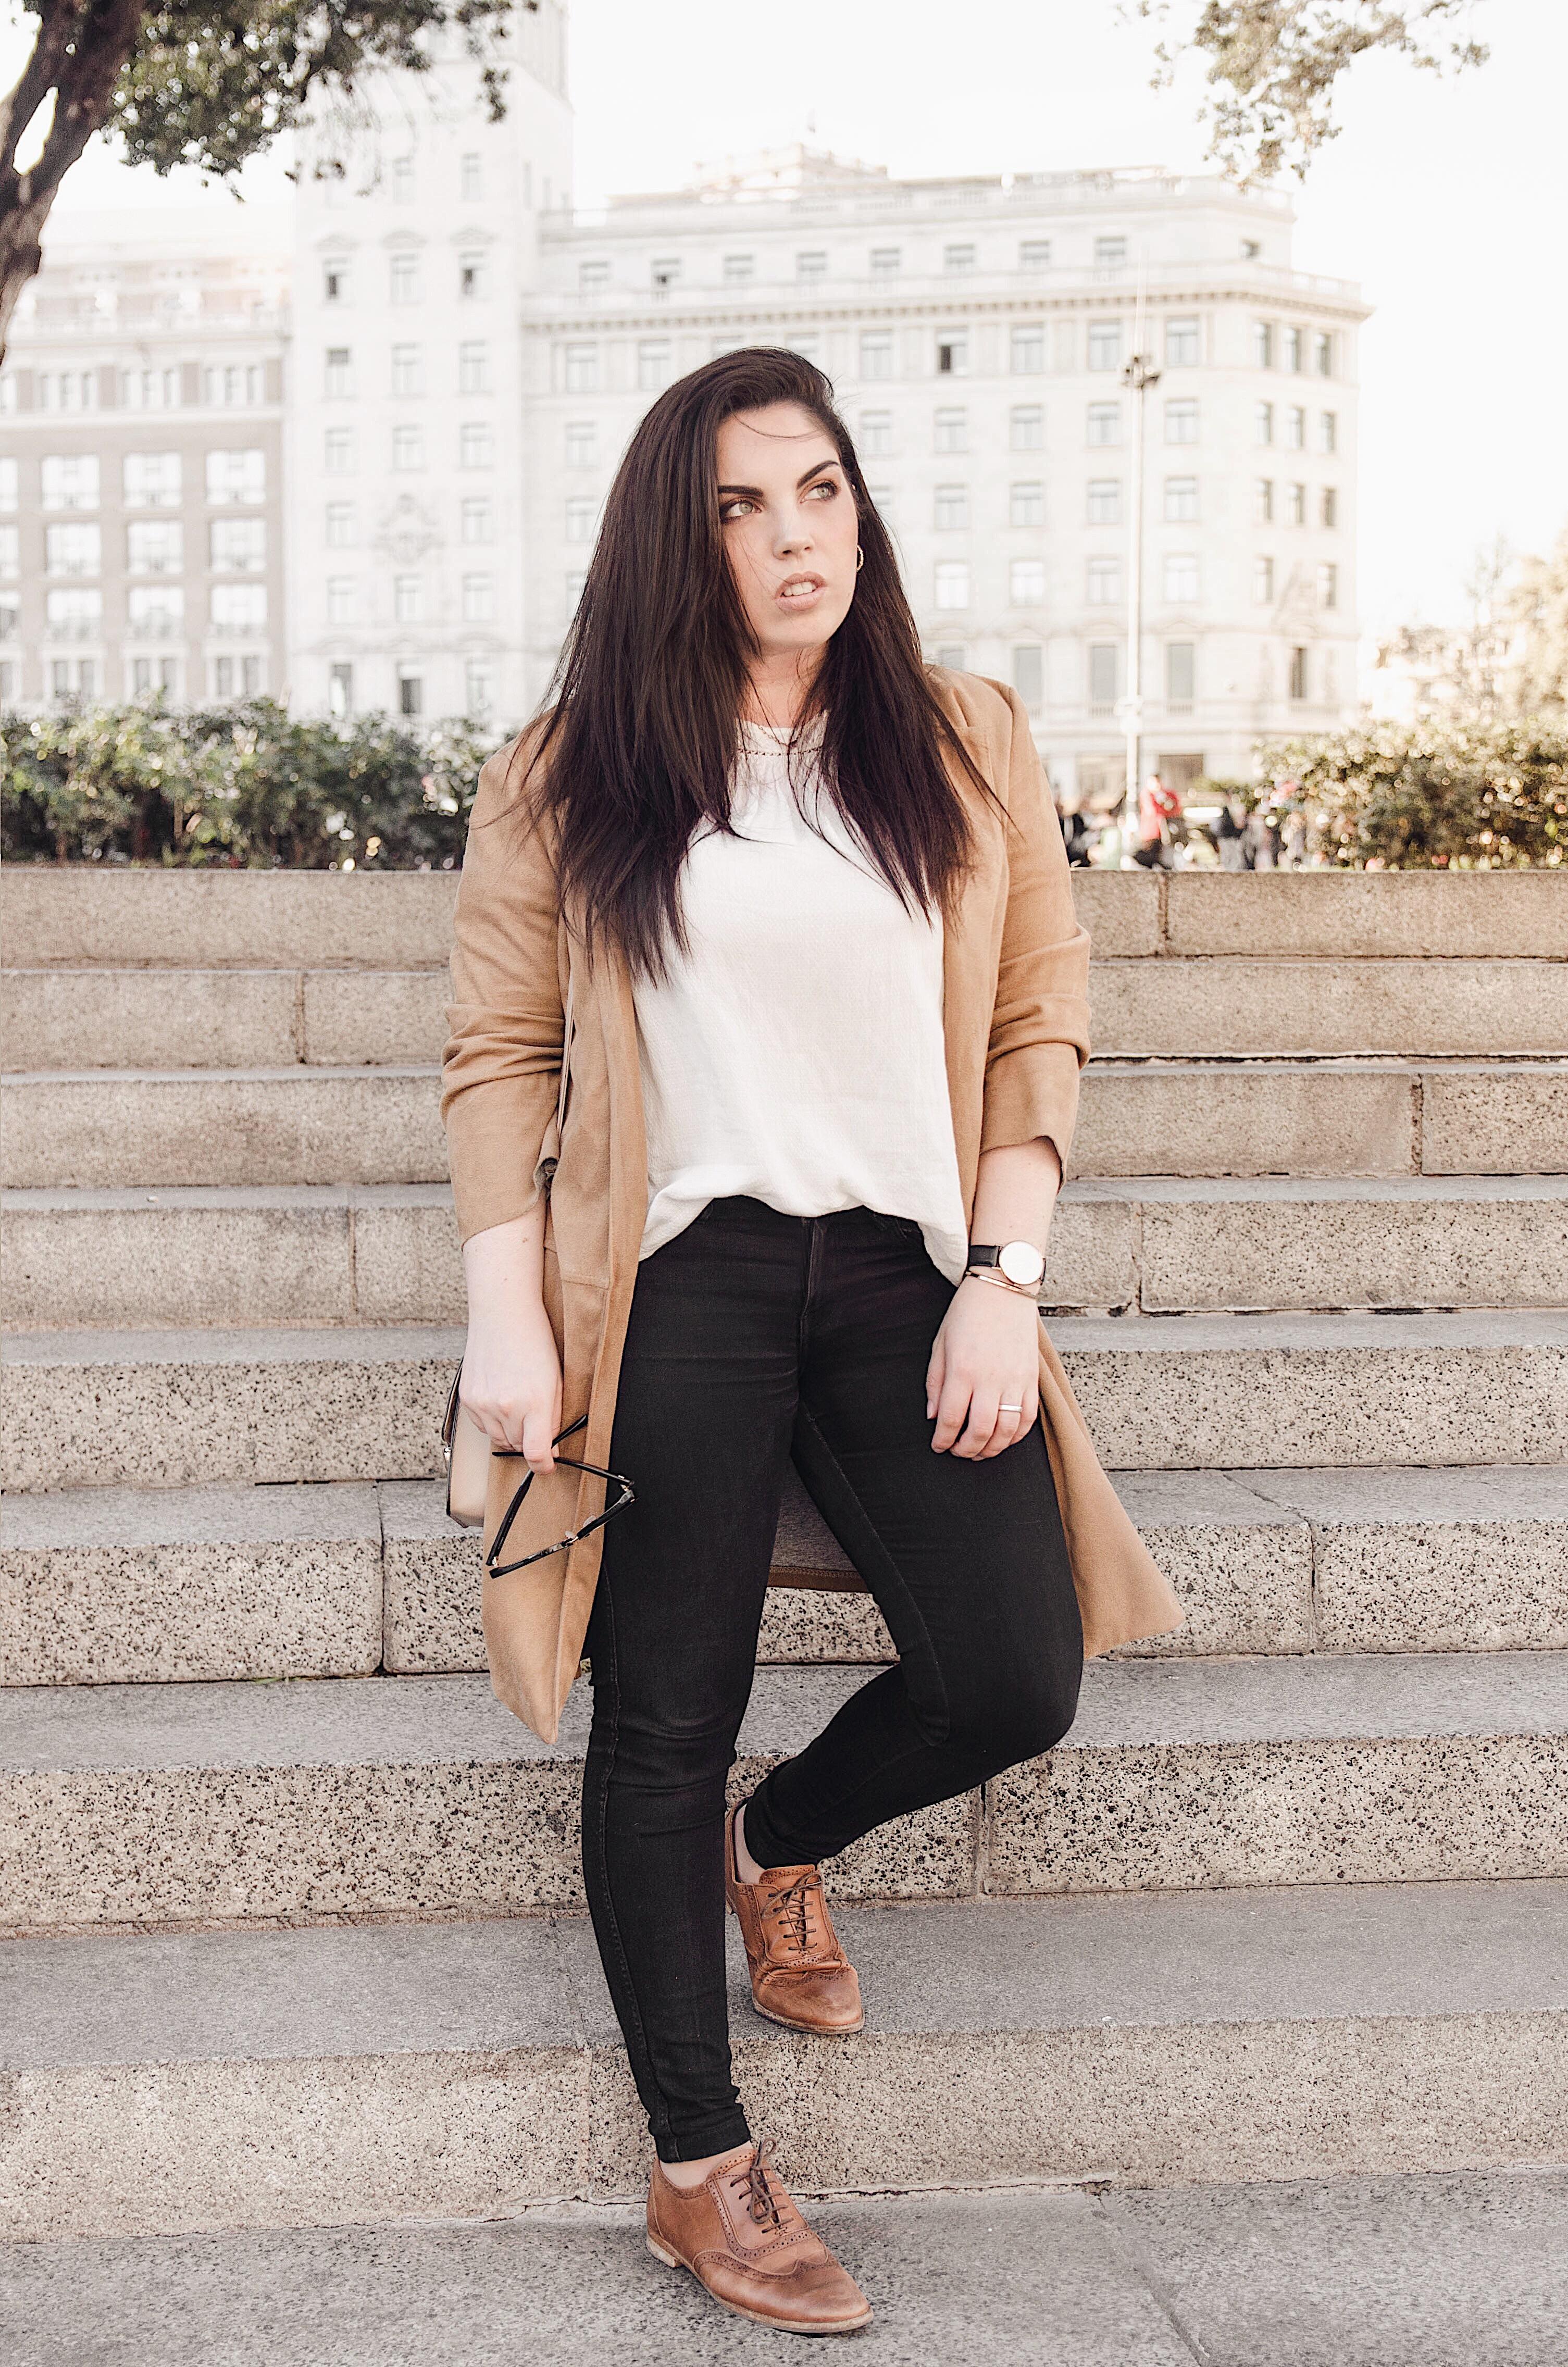 Como combinar un look marcando estilo con prendas básicas